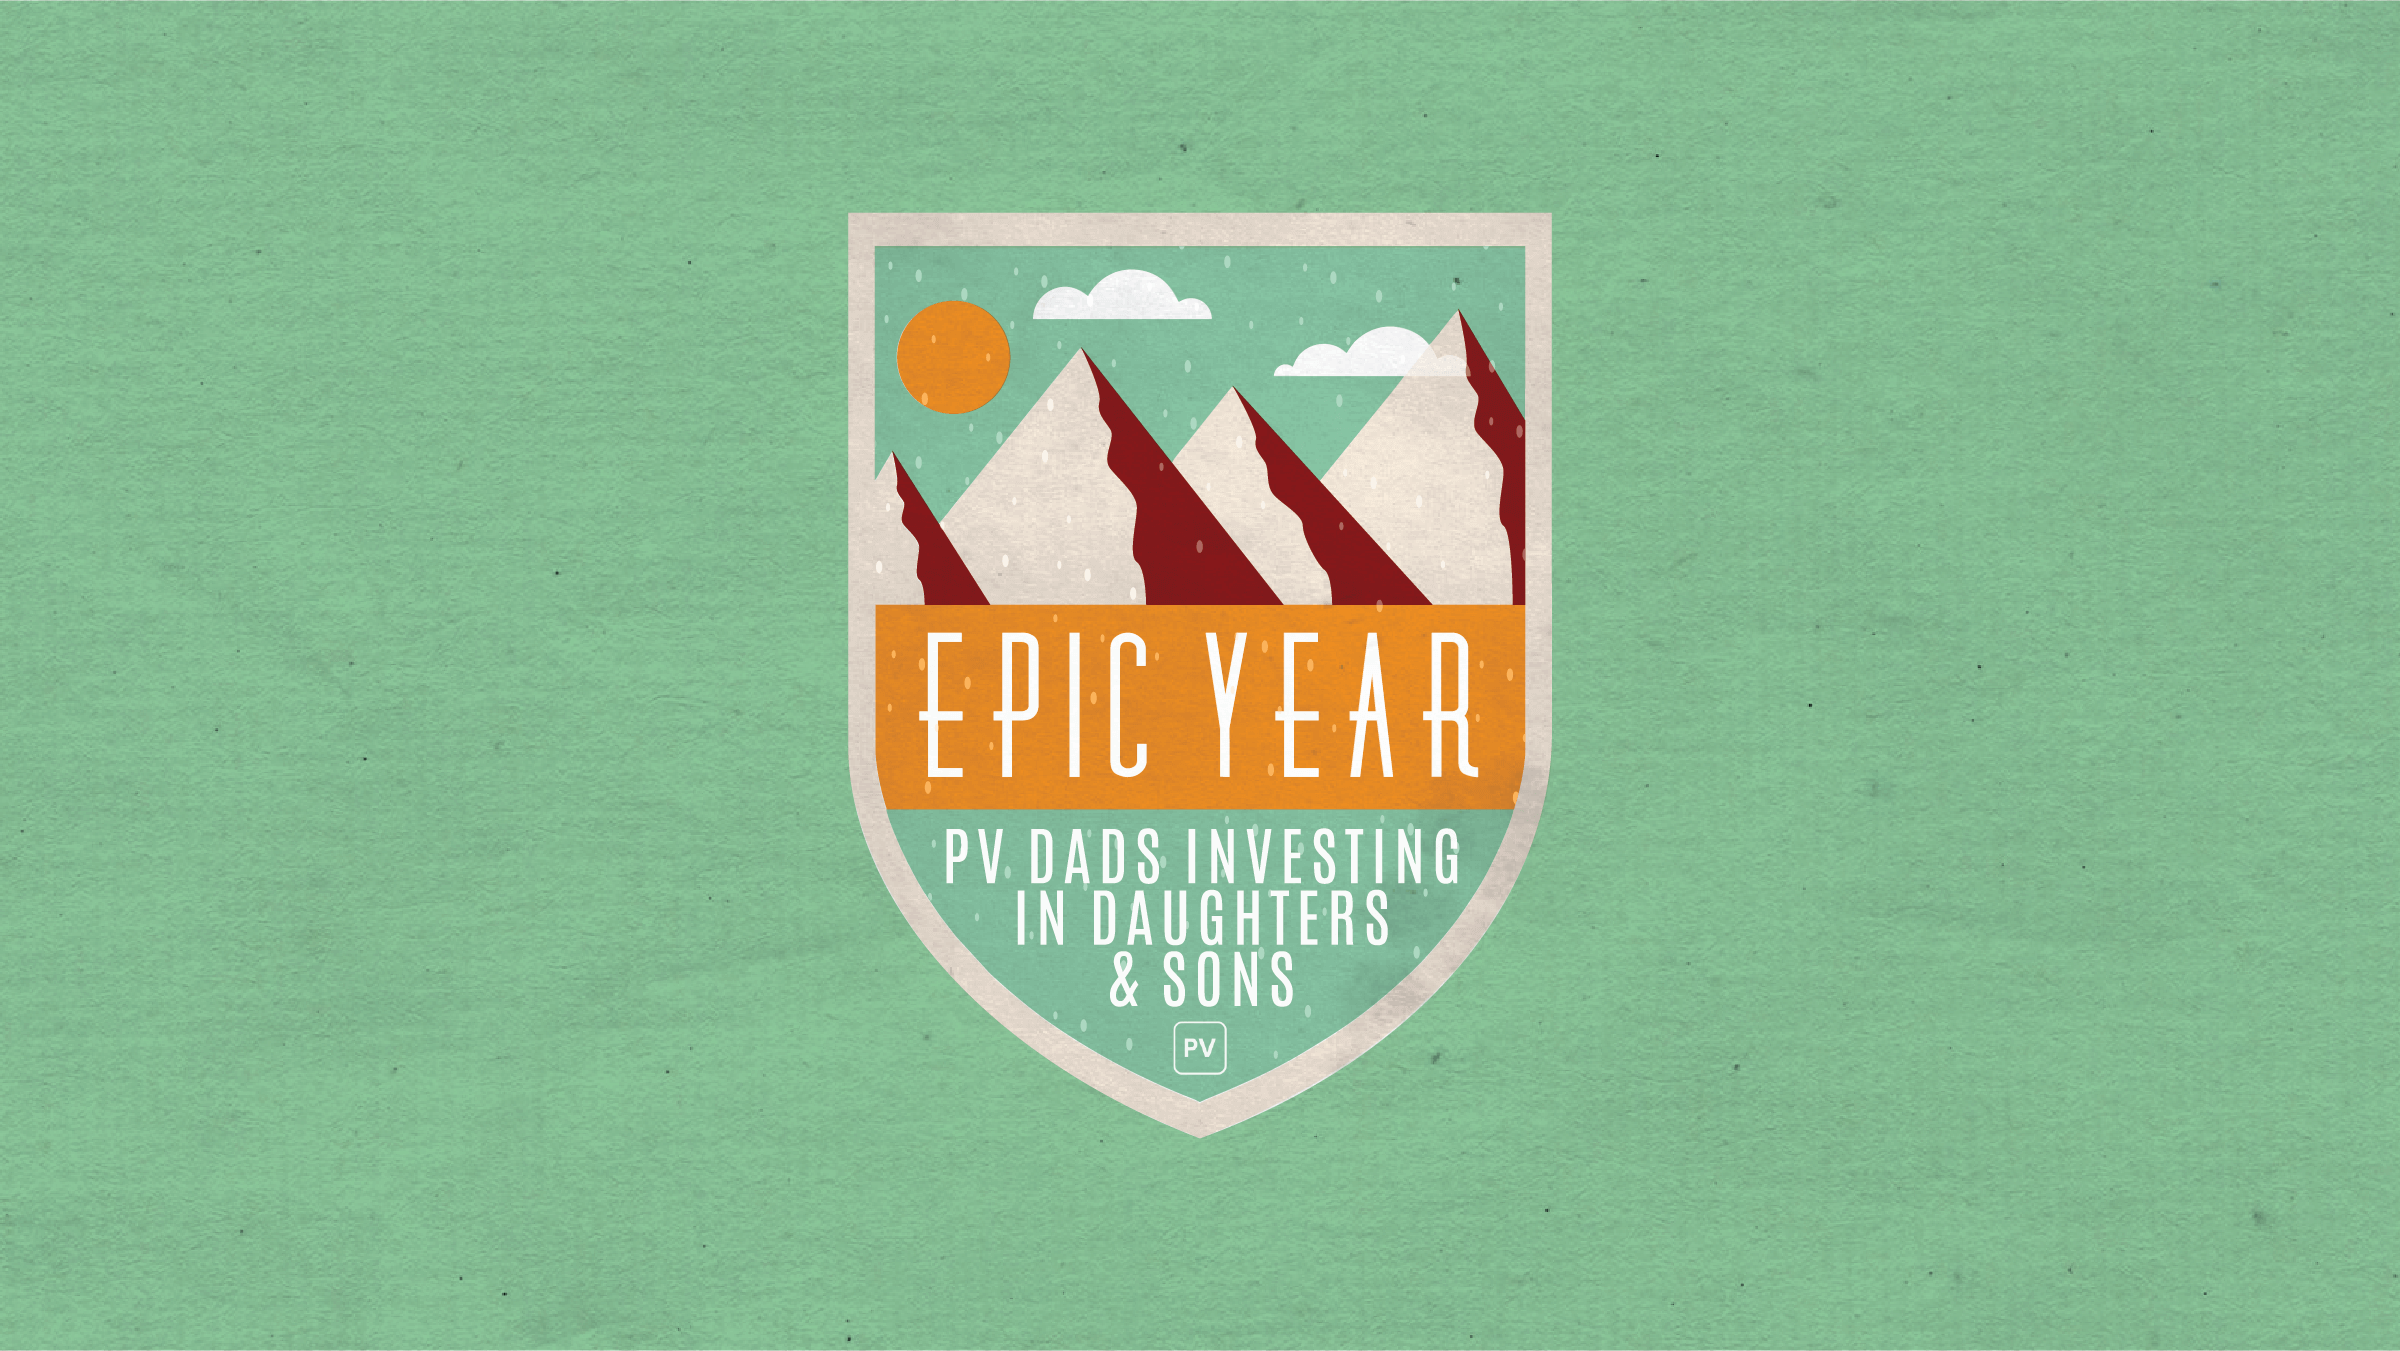 Epic Year